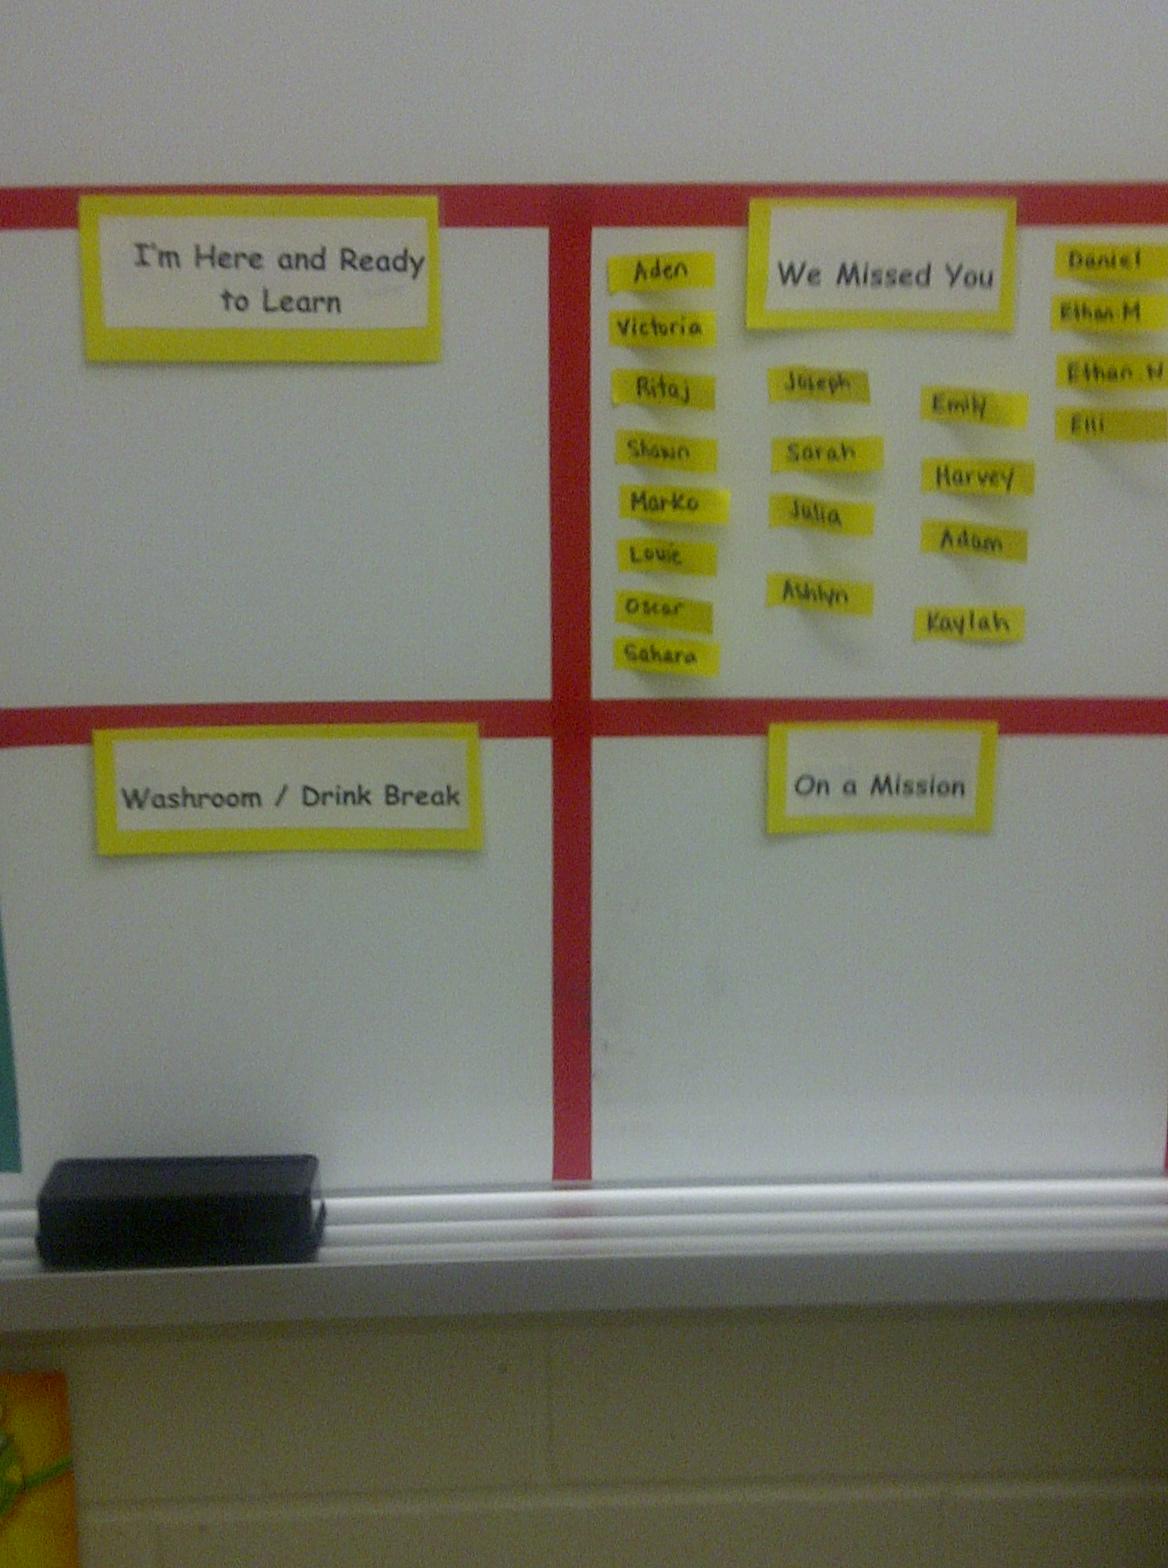 Innovative Classroom Management Tools ~ Classroom management tools the heart and art of teaching